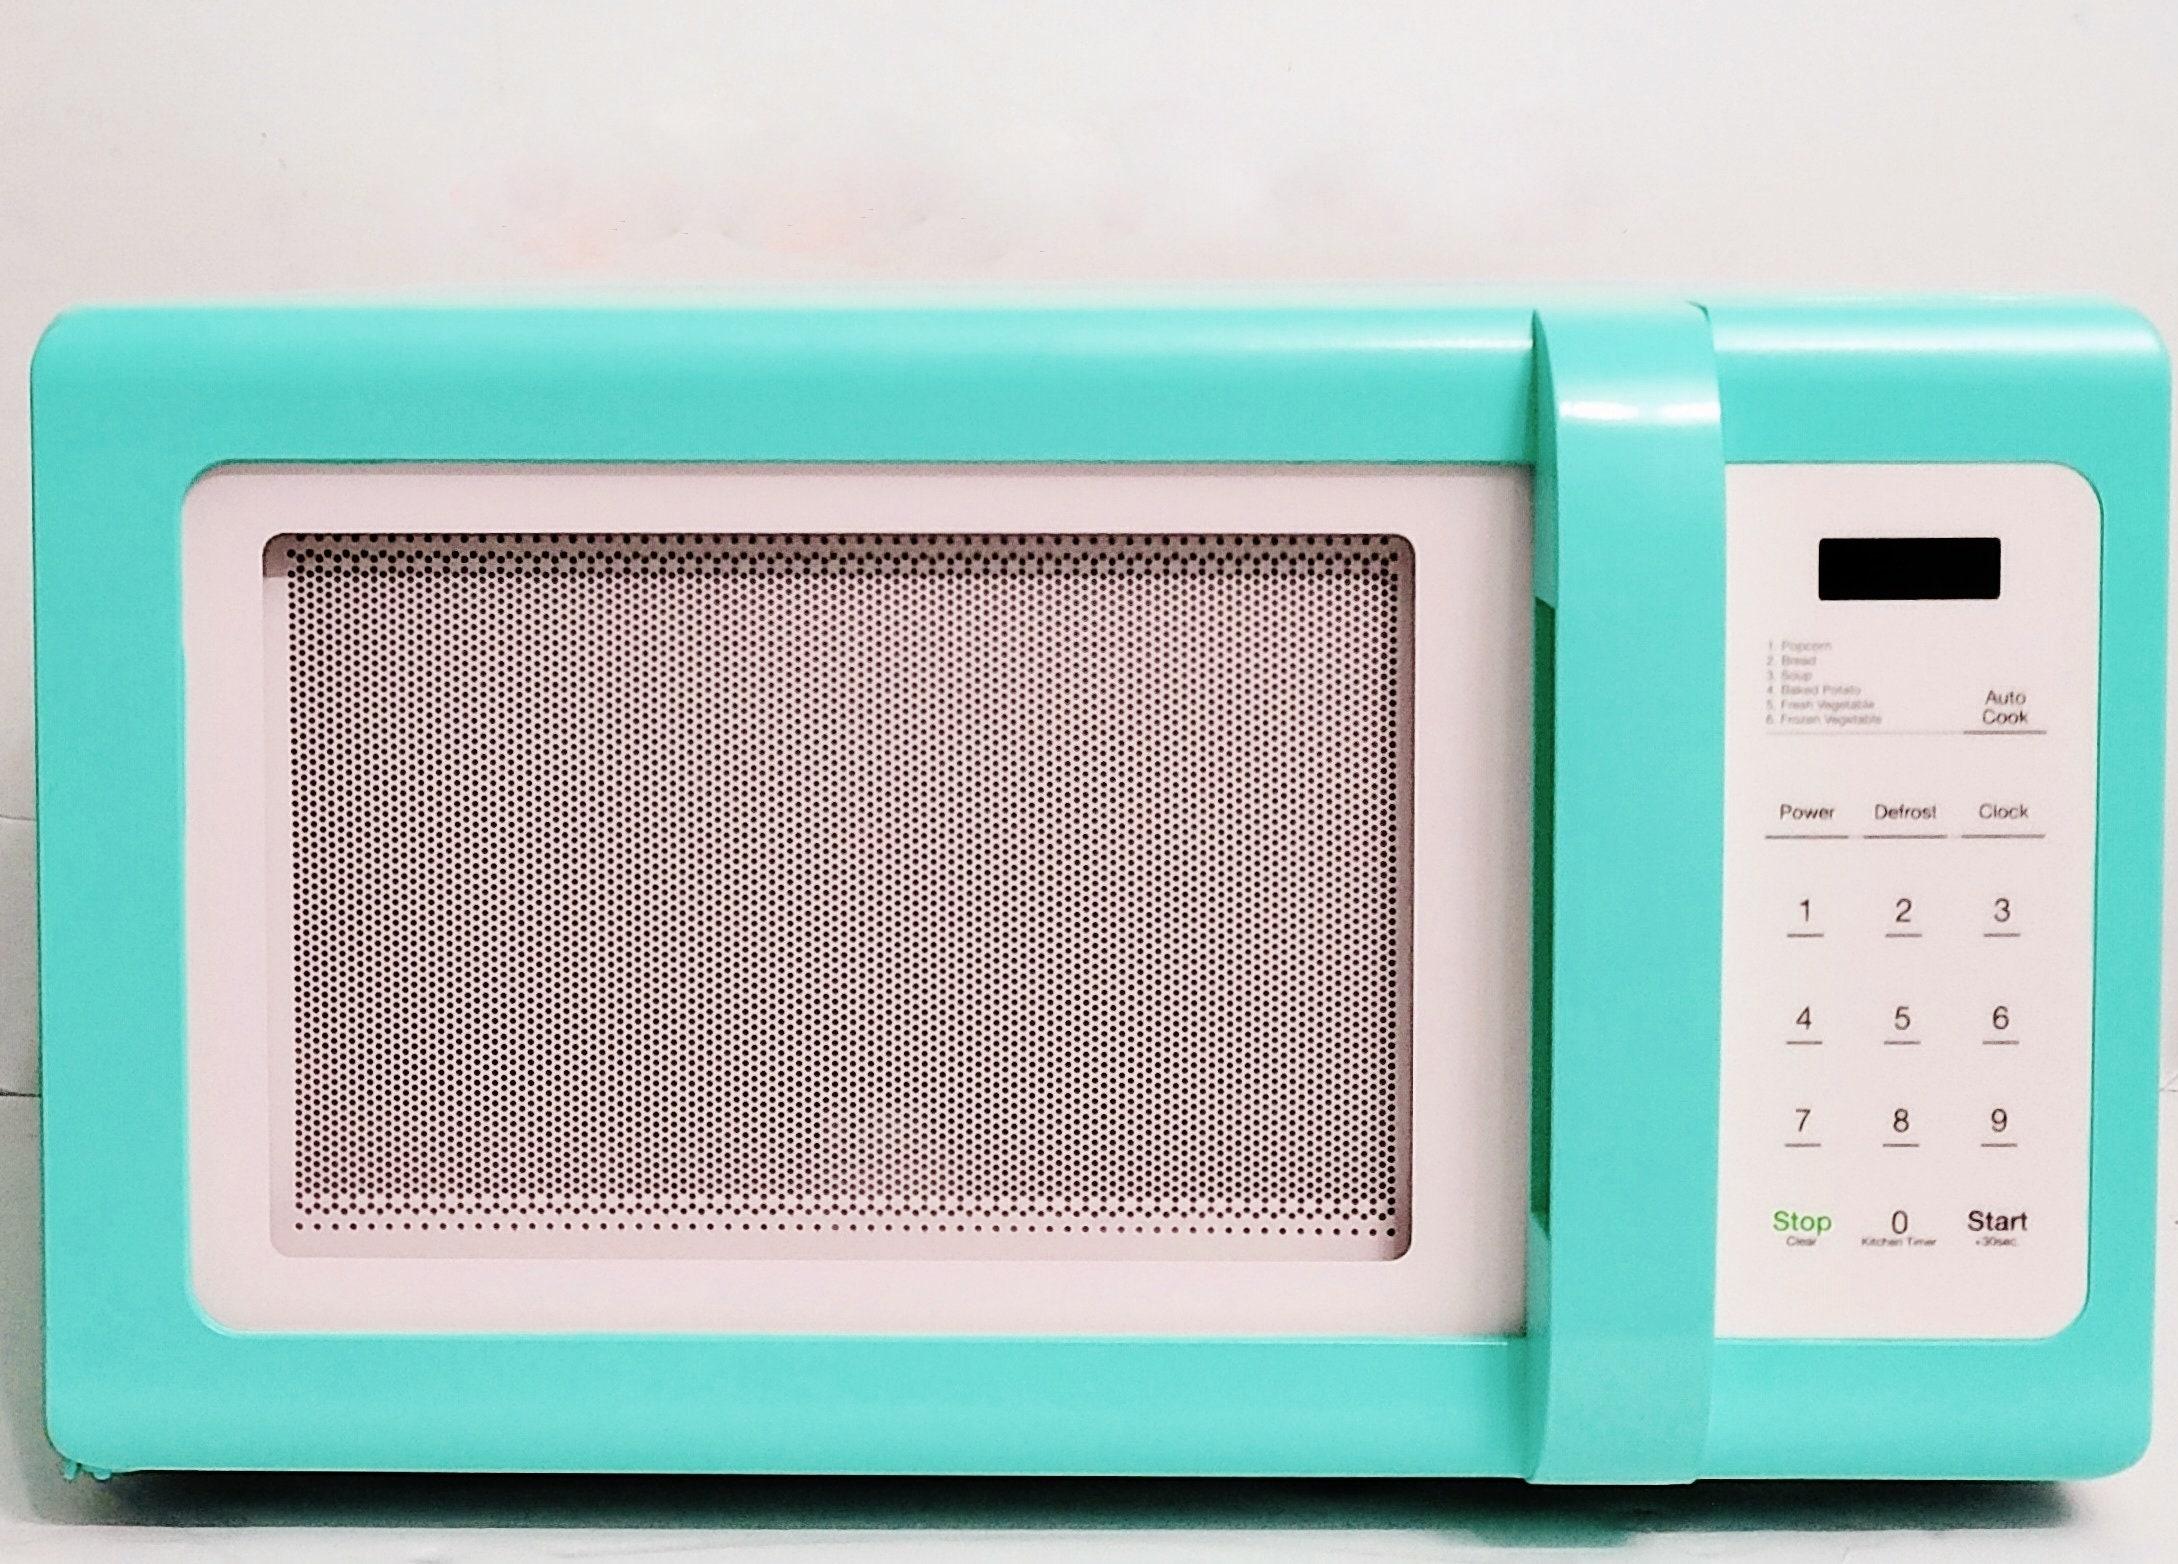 Turquoise Magic Chef Microwave Turquiose 900 Watt Microwave Etsy